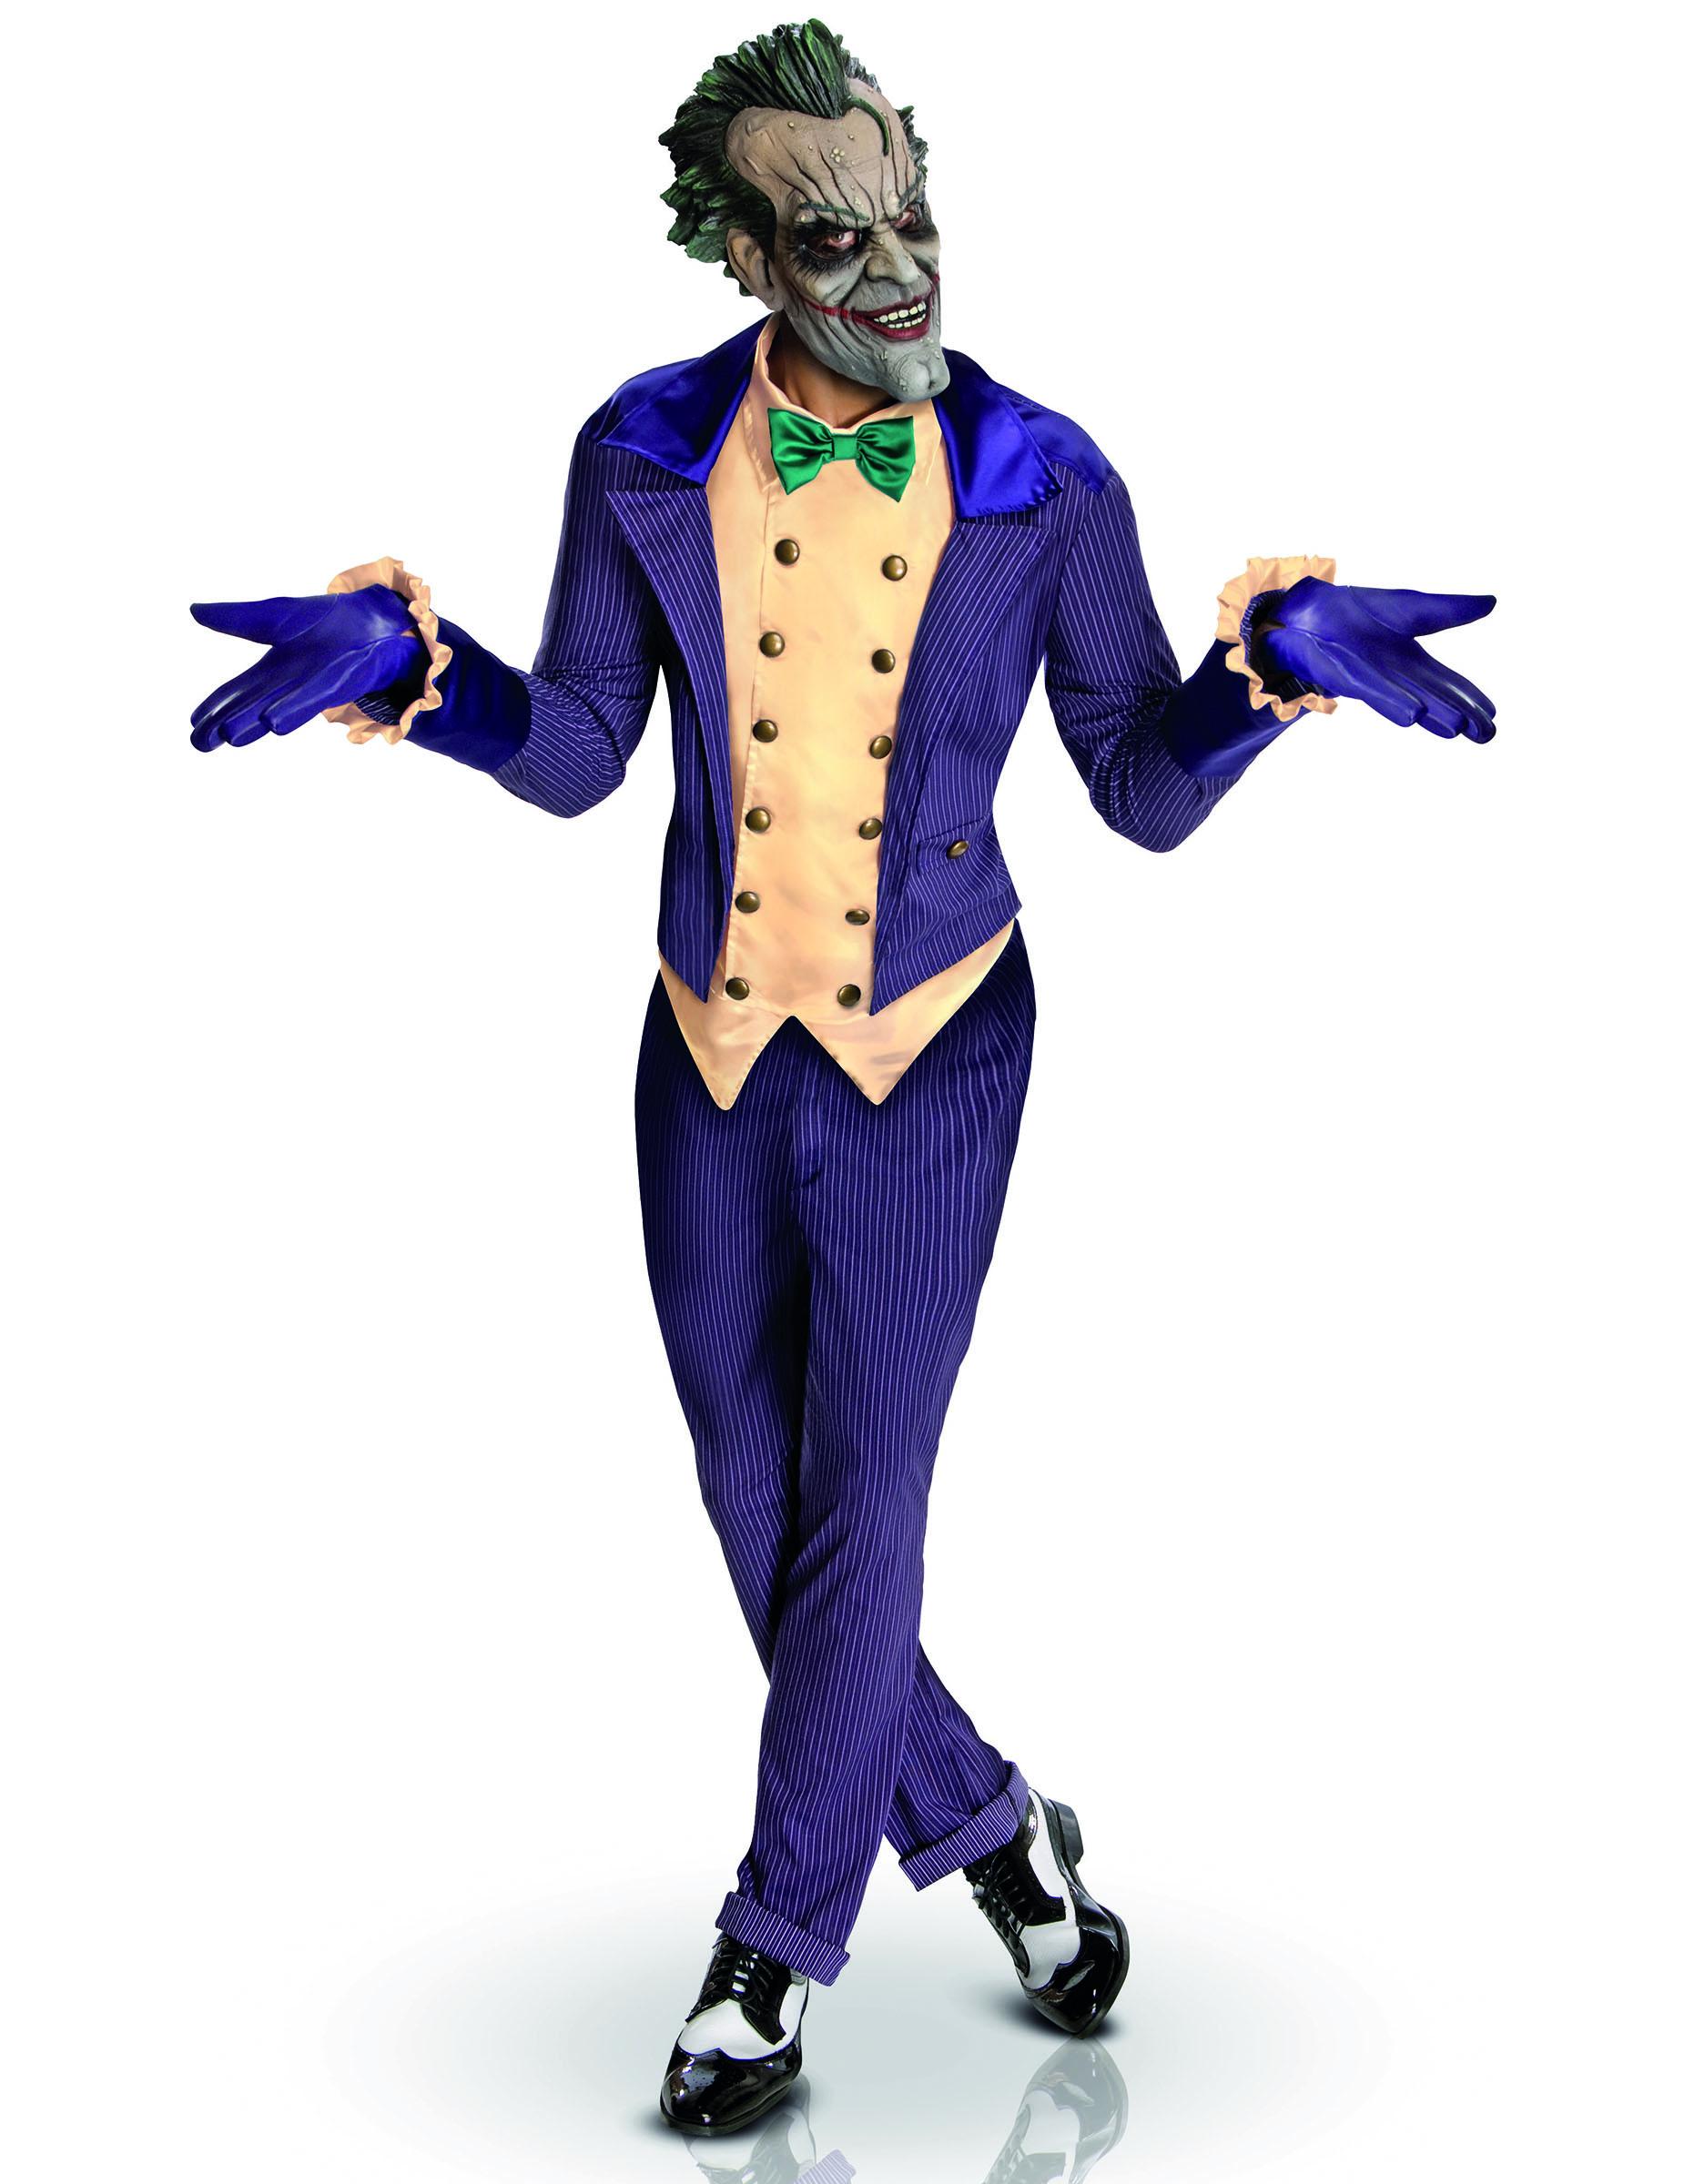 Hedendaags Disfarce Joker™ Gotham City adulto: Disfarces Adultos,mascarilhas MQ-26